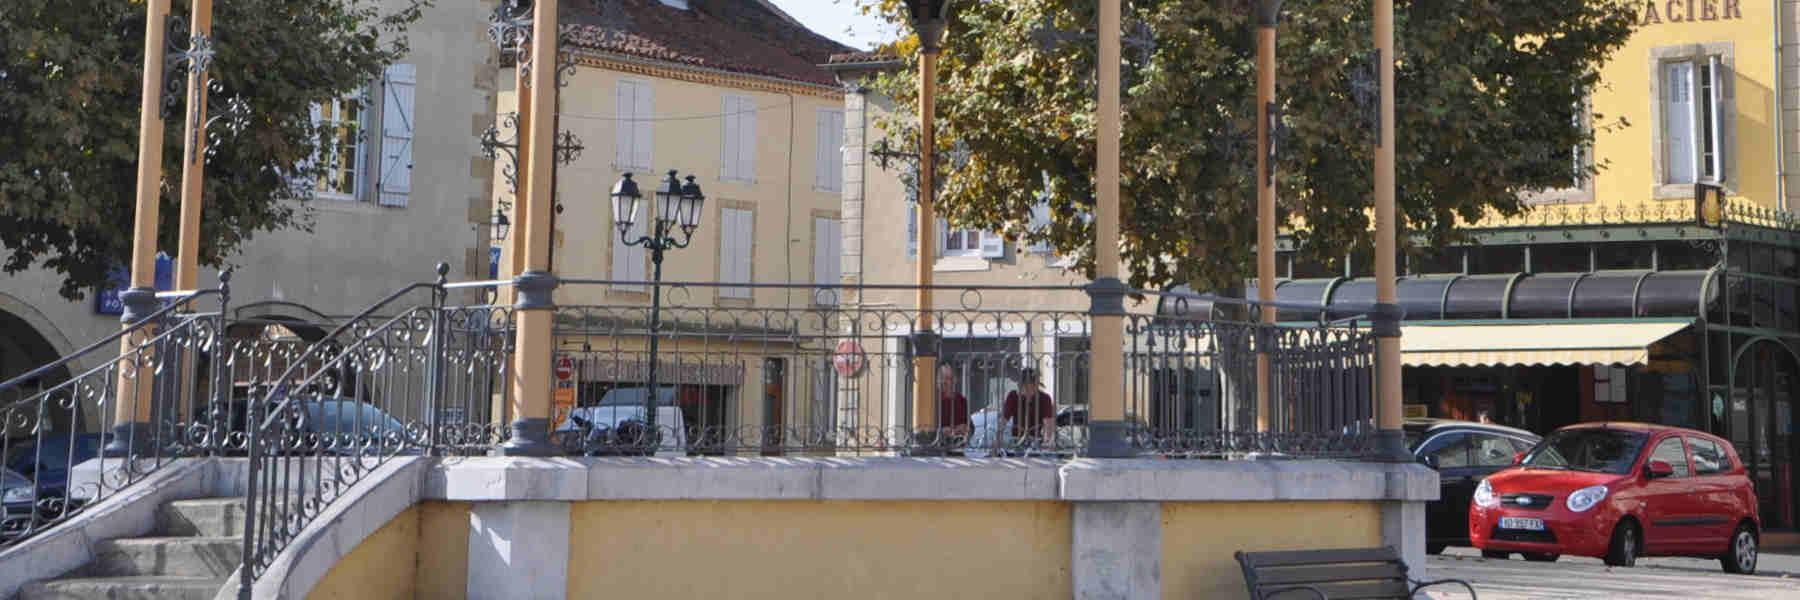 Les initiatives de la ville cittaslow de Mirande